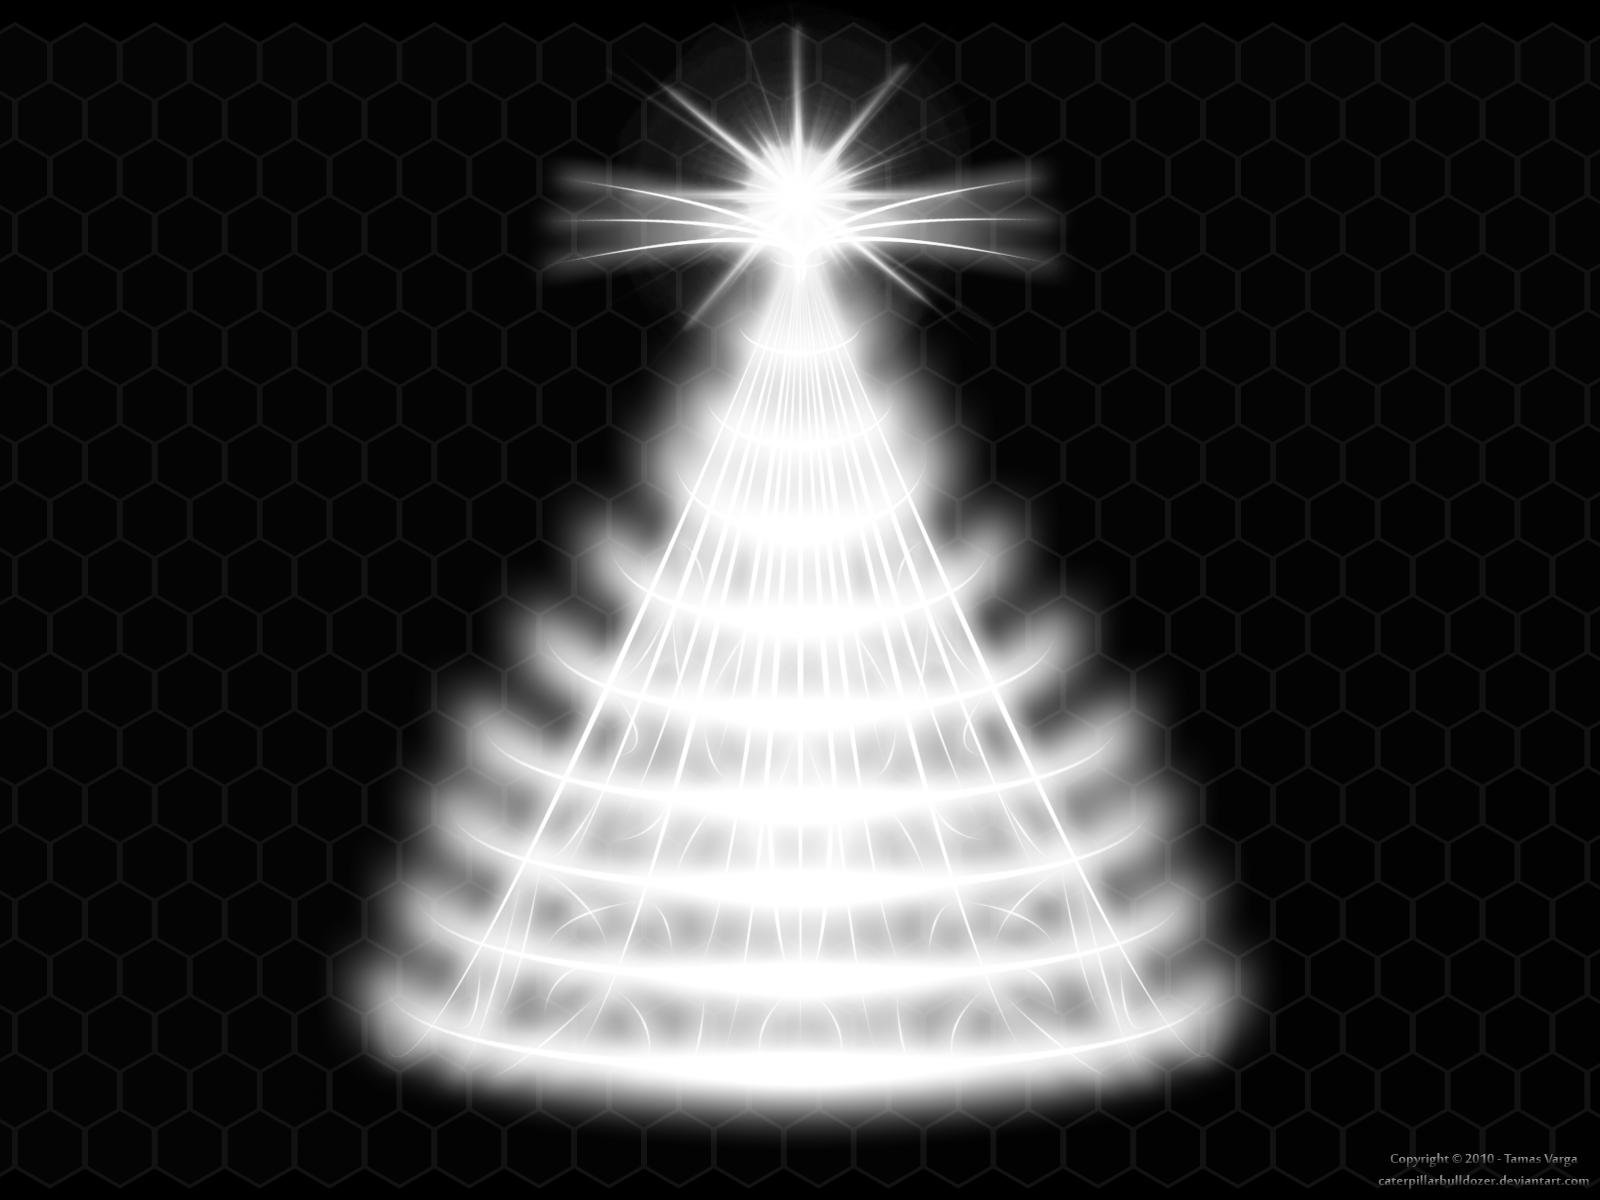 Vector Christmas Tree by CaterpillarBulldozer on DeviantArt